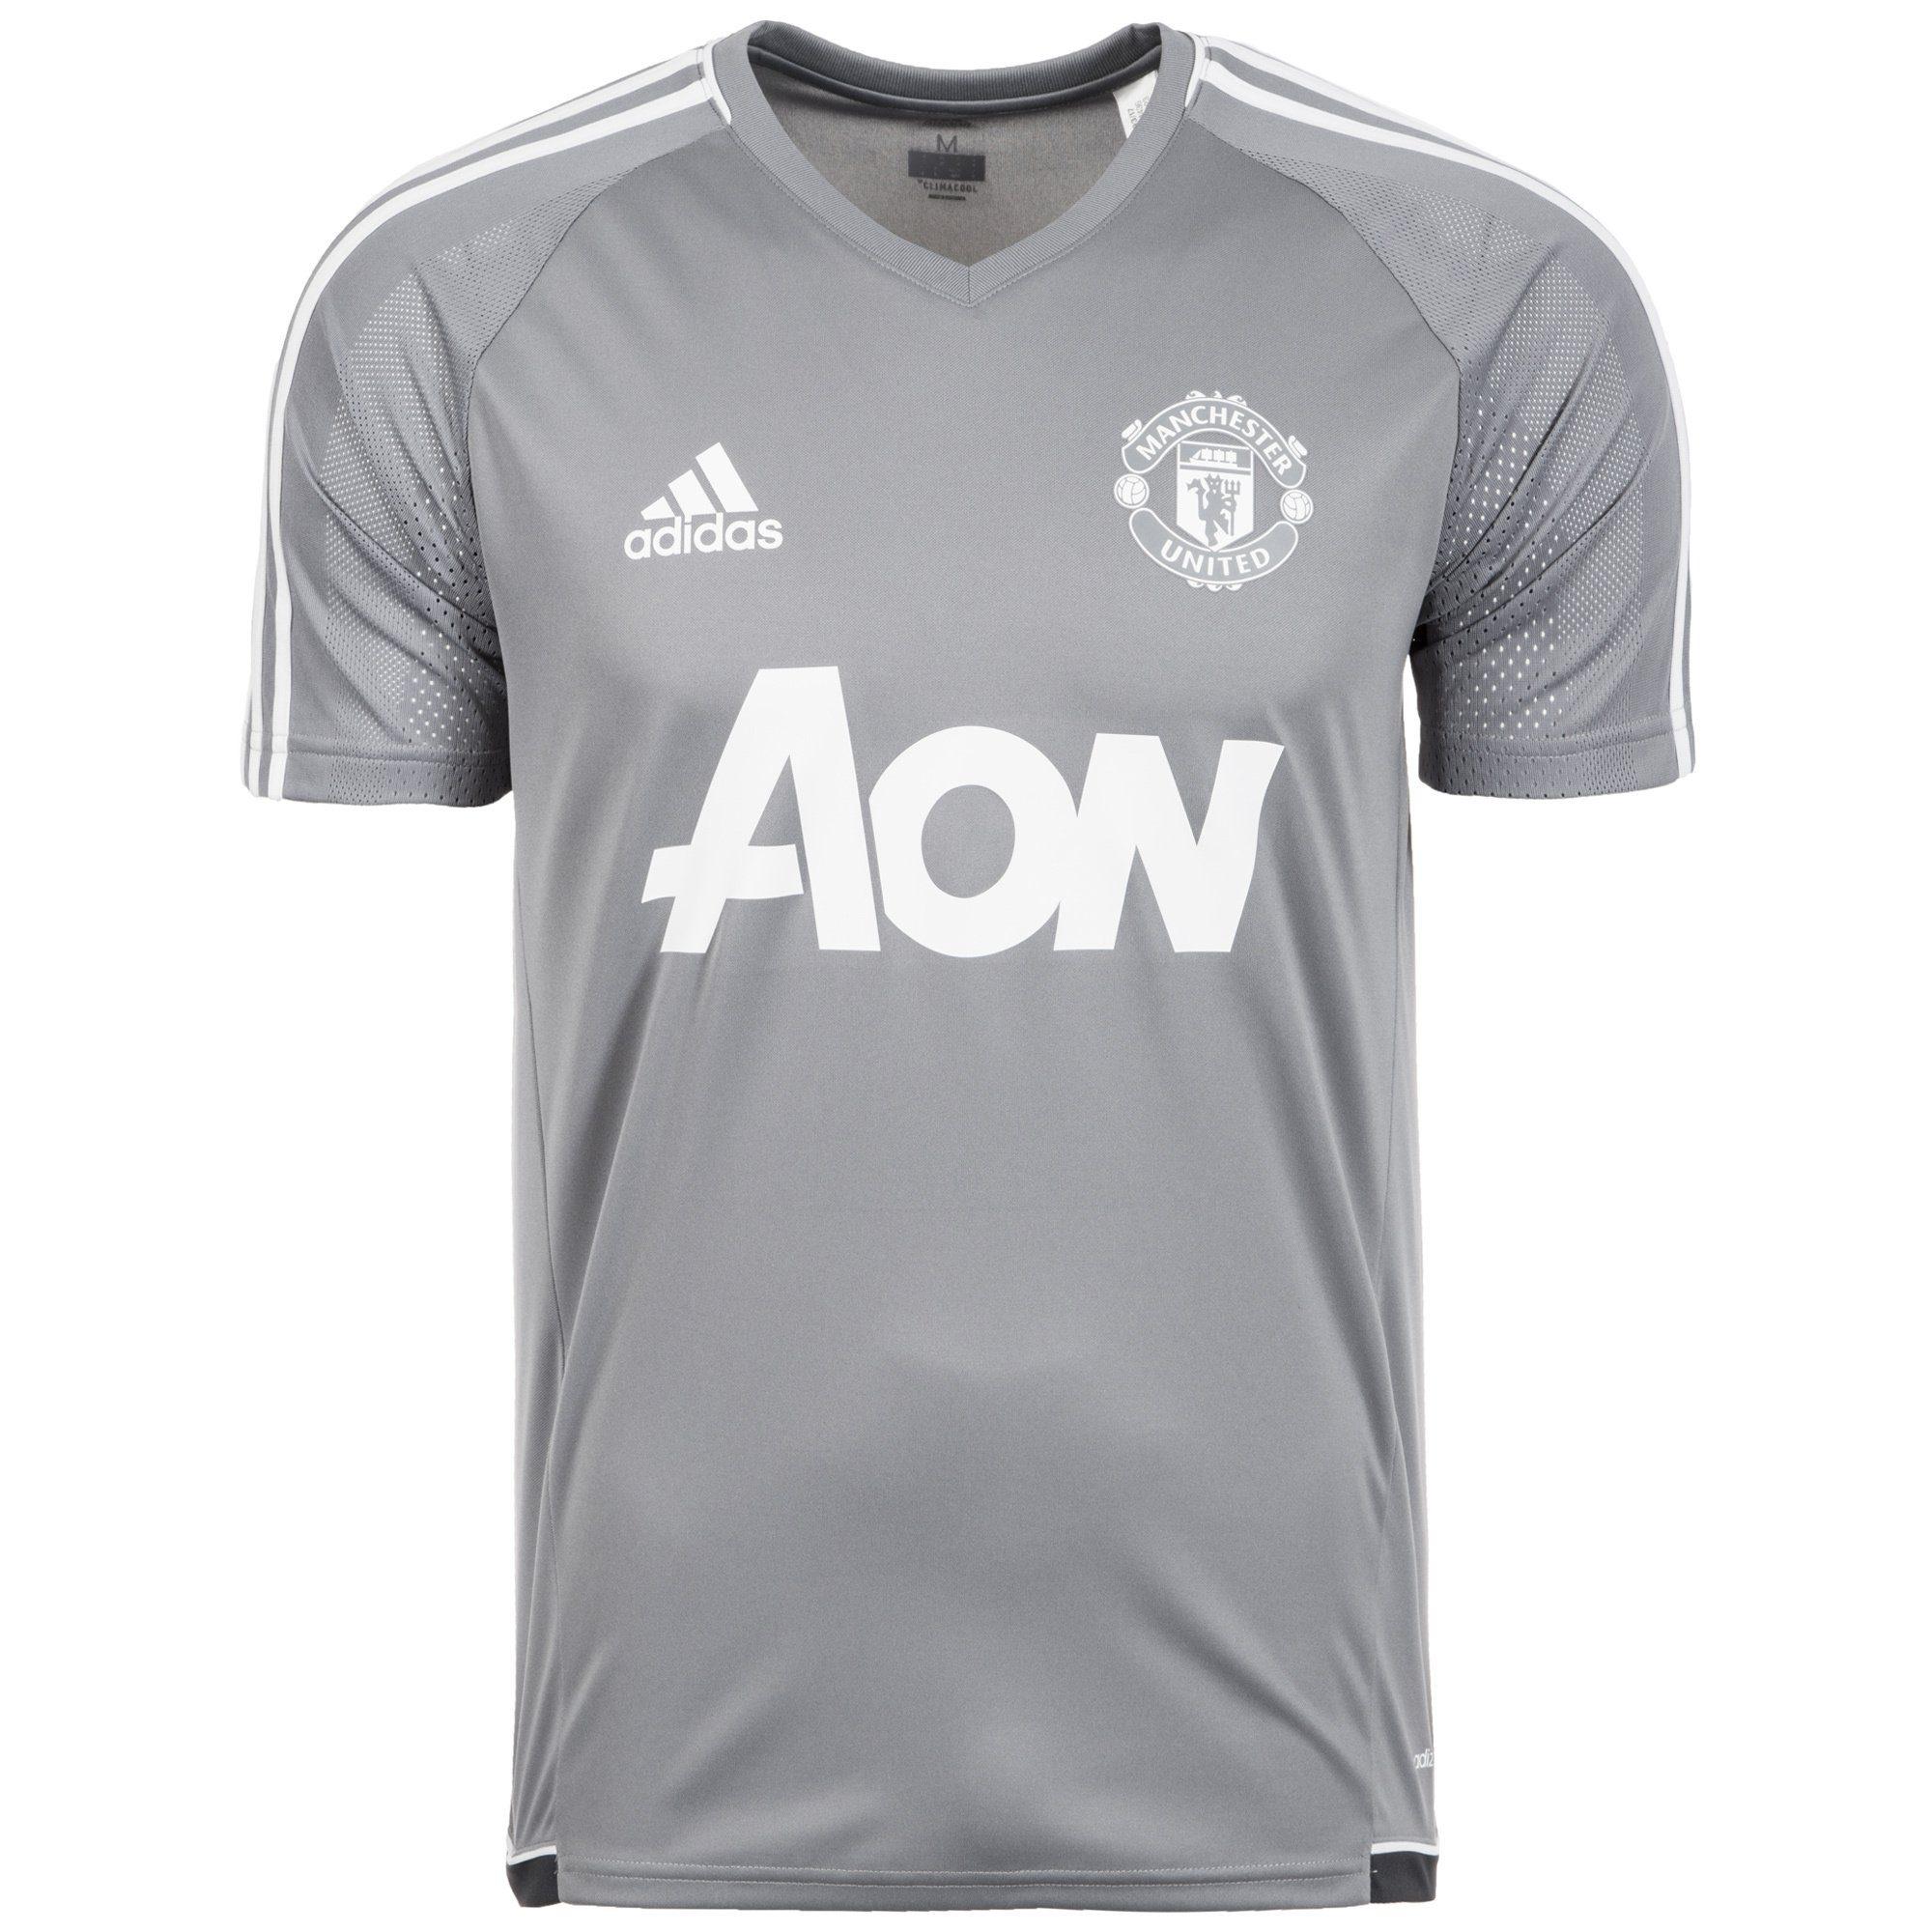 adidas Performance Trainingsshirt »Manchester United Authentic«   Sportbekleidung > Sportshirts > Funktionsshirts   Grau   Trikot   ADIDAS PERFORMANCE